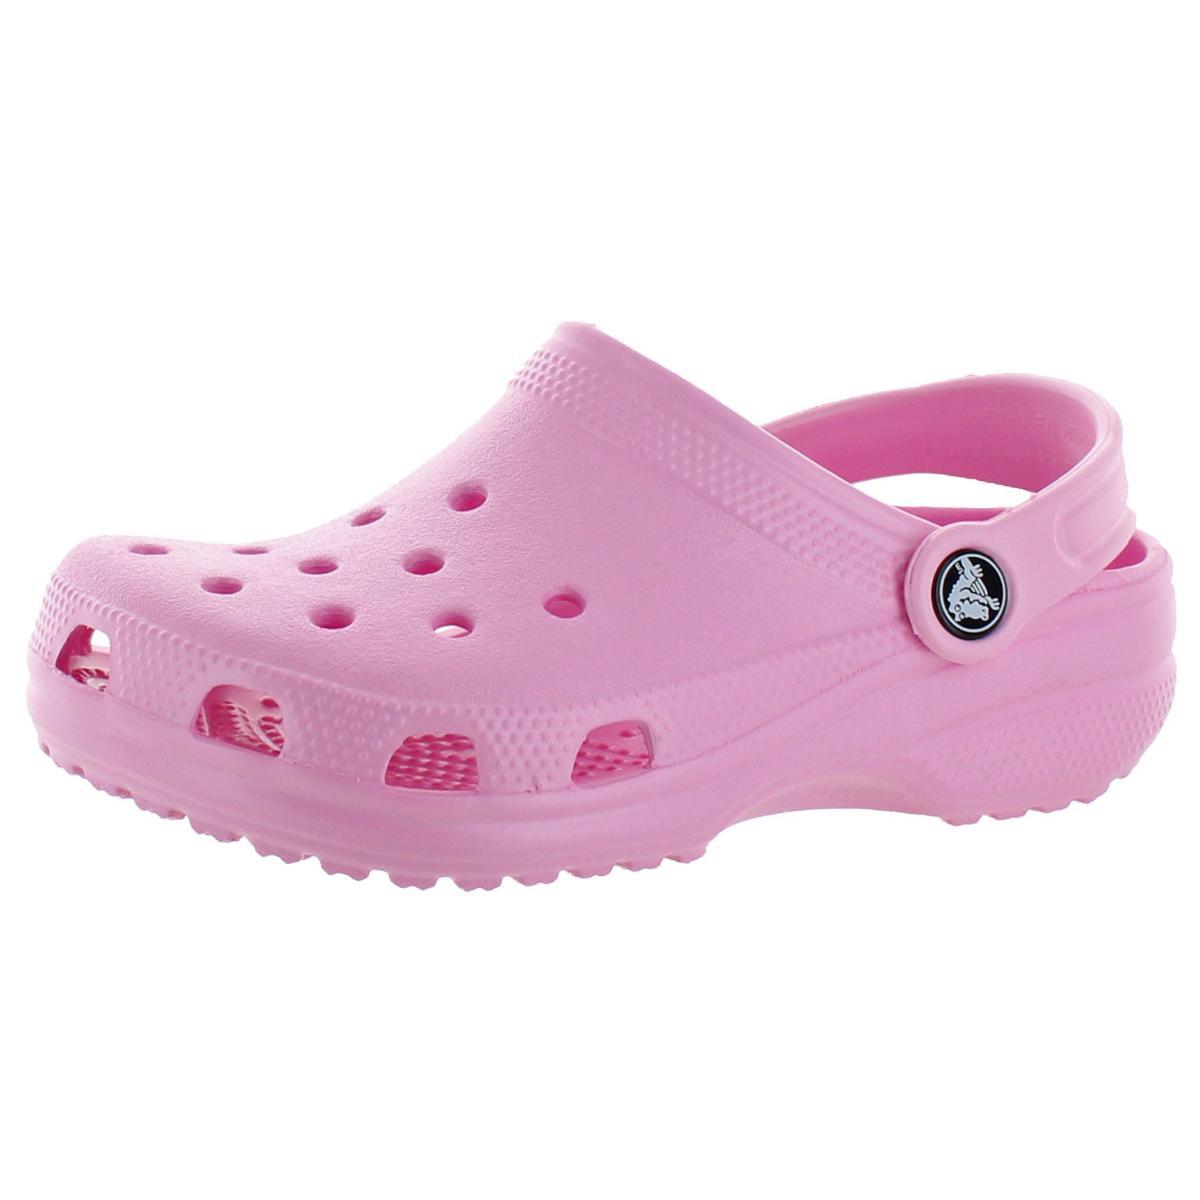 16a08e6955871 BHFO  Crocs Unisex Kids Classic Croslite Clog Shoes